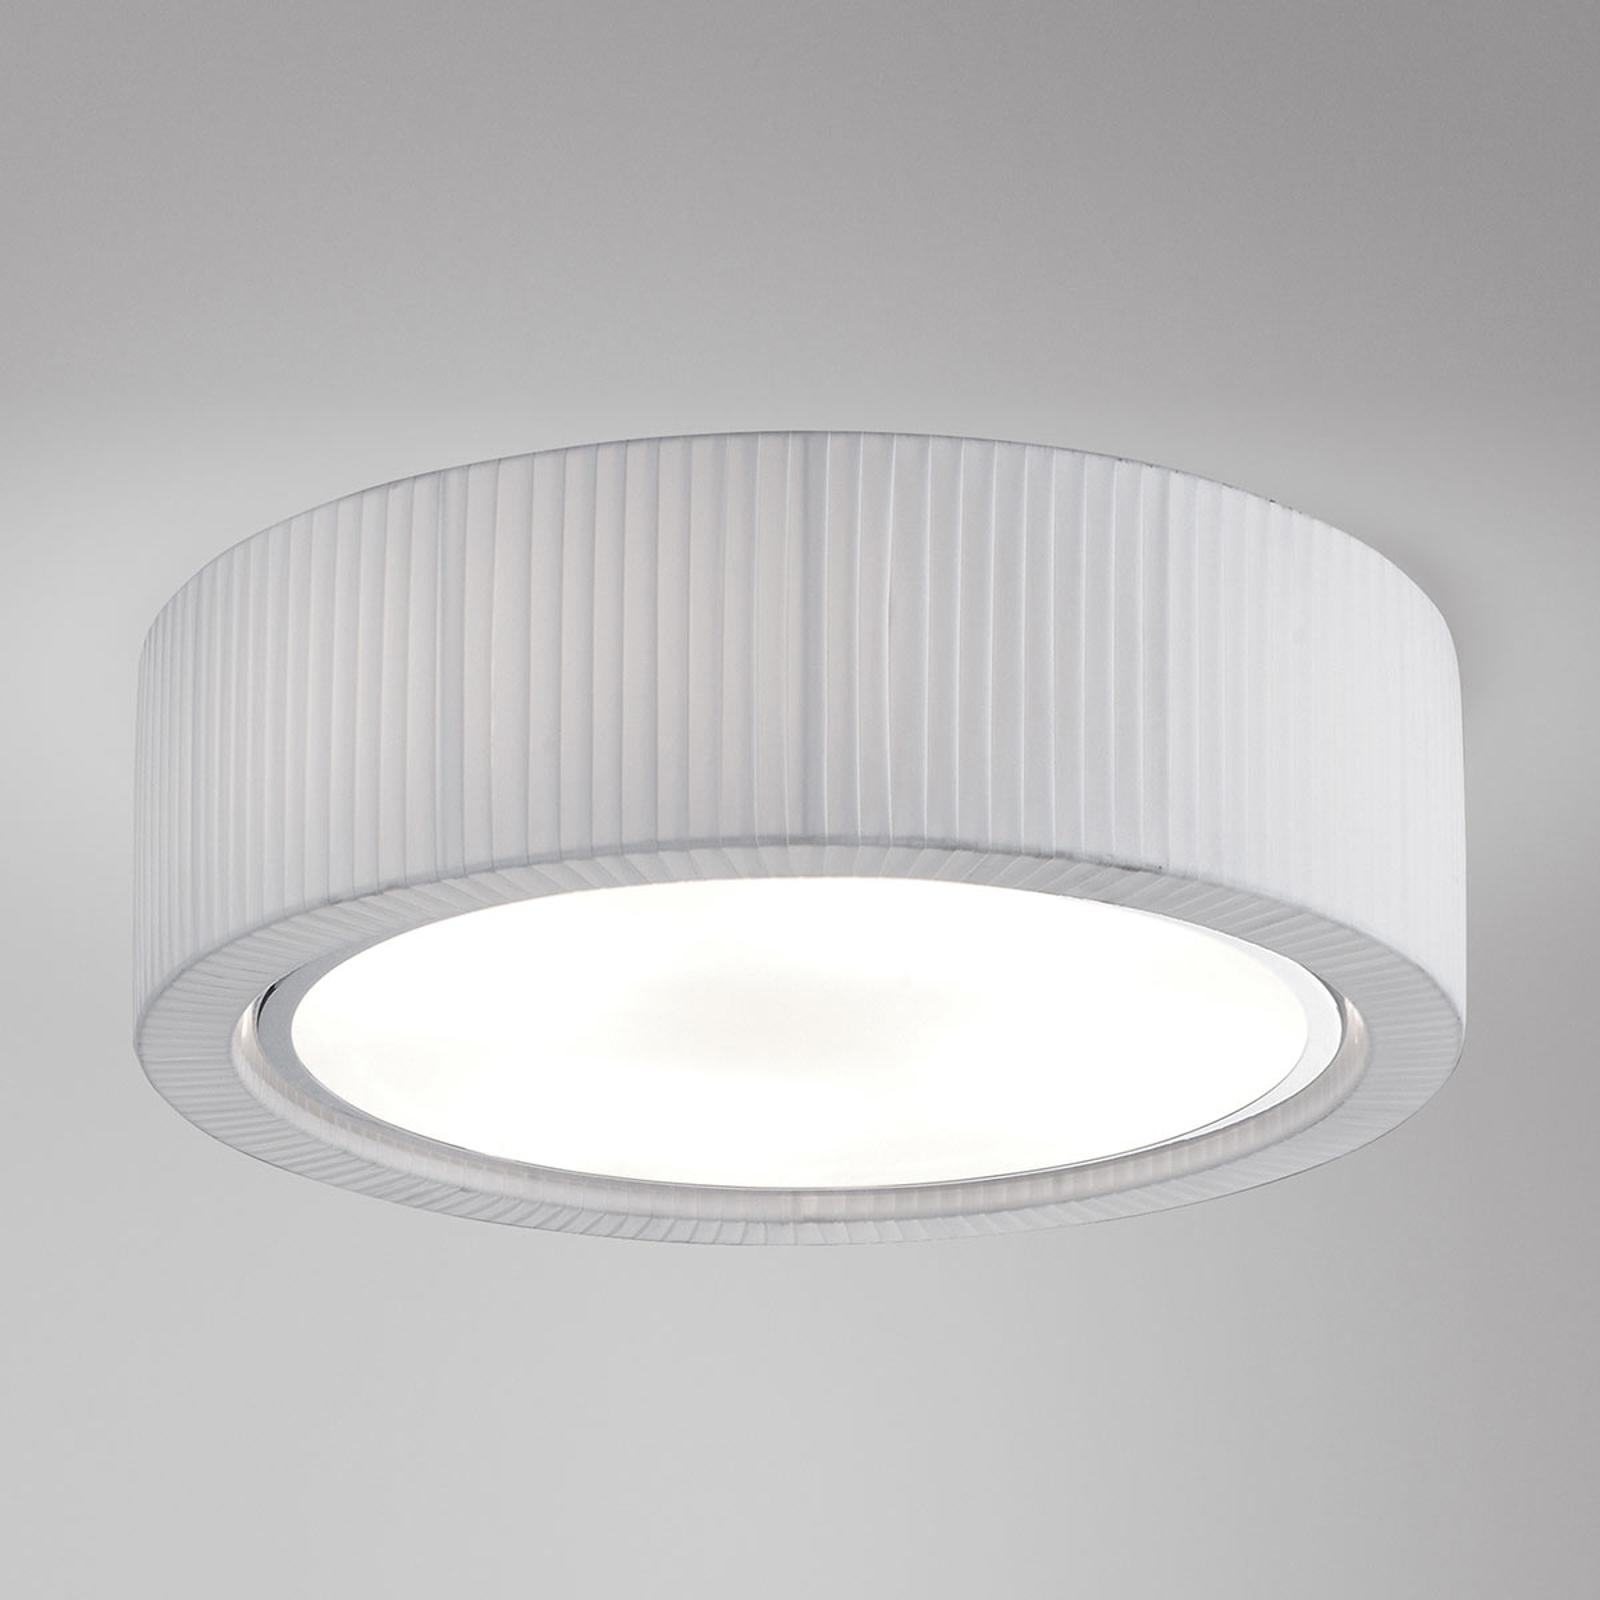 Bover Urban PF/37 plafondlamp, wit, 37 cm